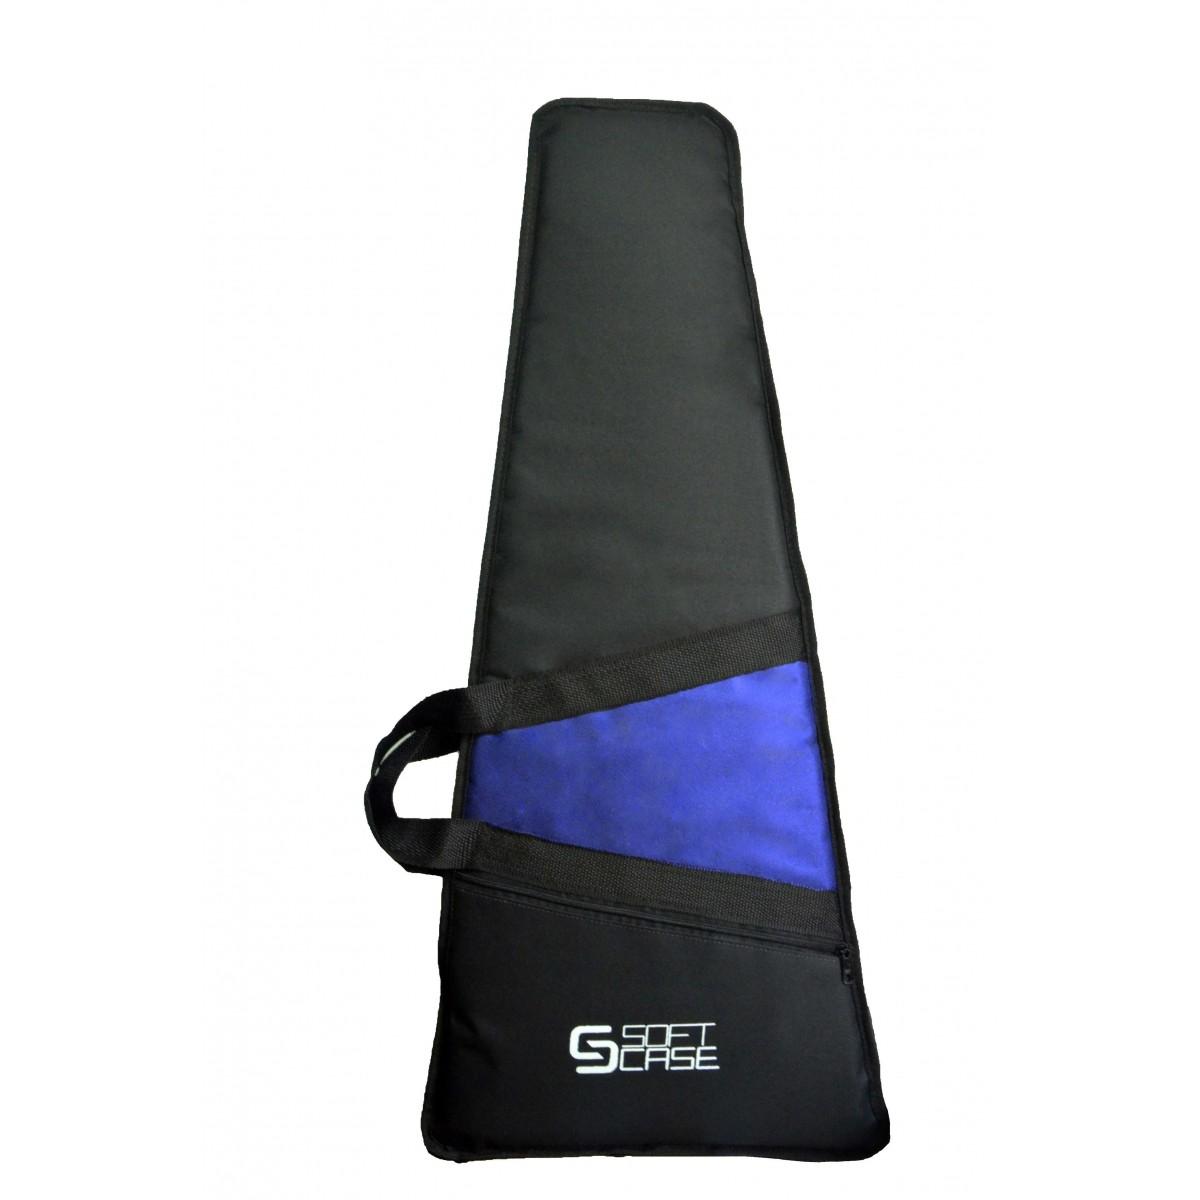 Capa Guitarra Soft Case Start Infantil Almofadada - Azul